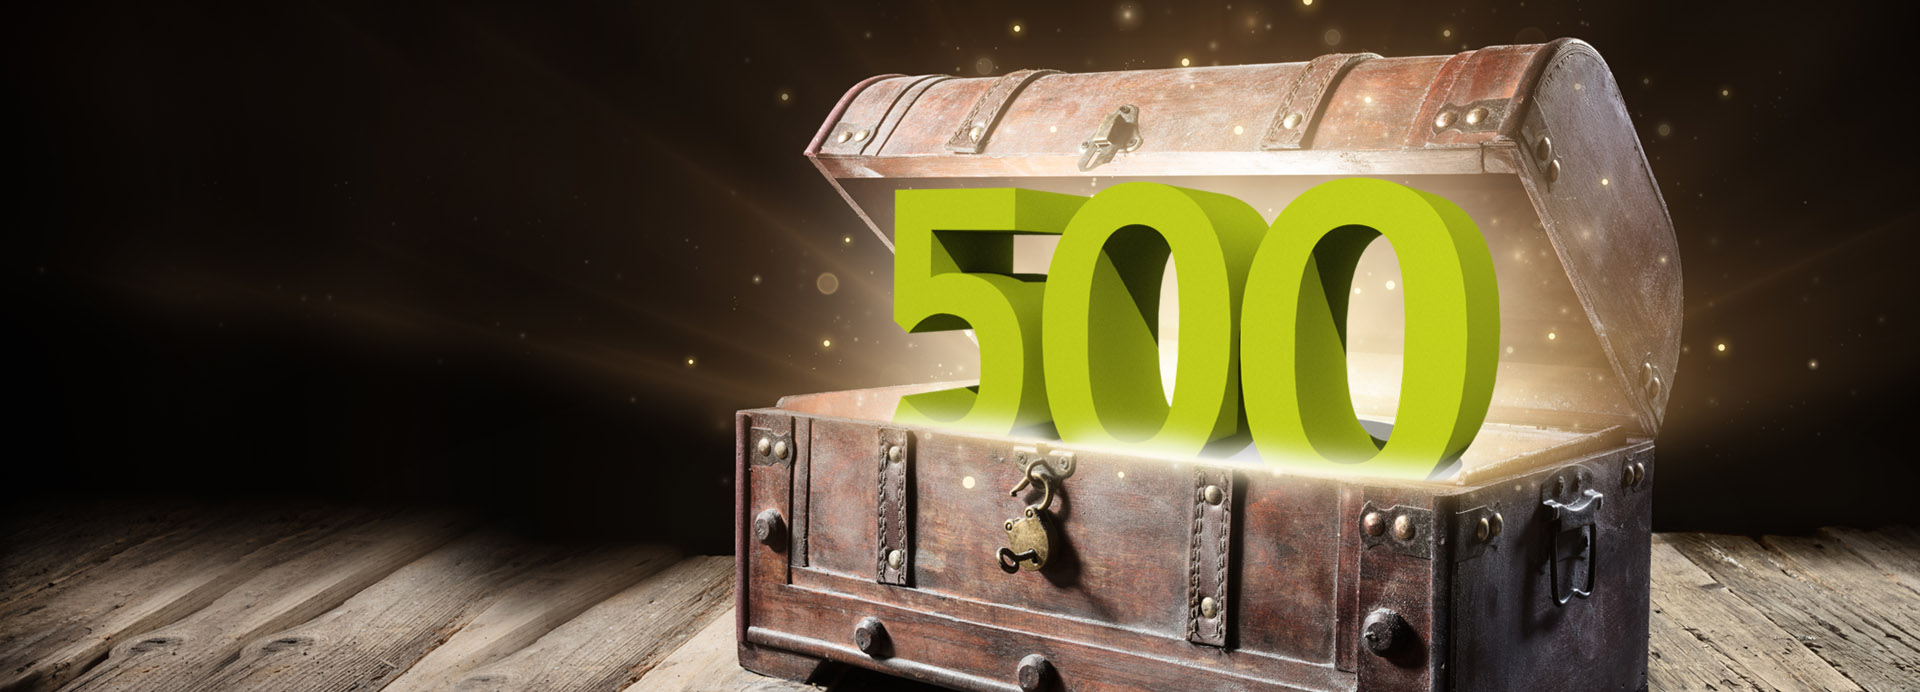 Jetzt 500 Extra-<br>Treuepunkte